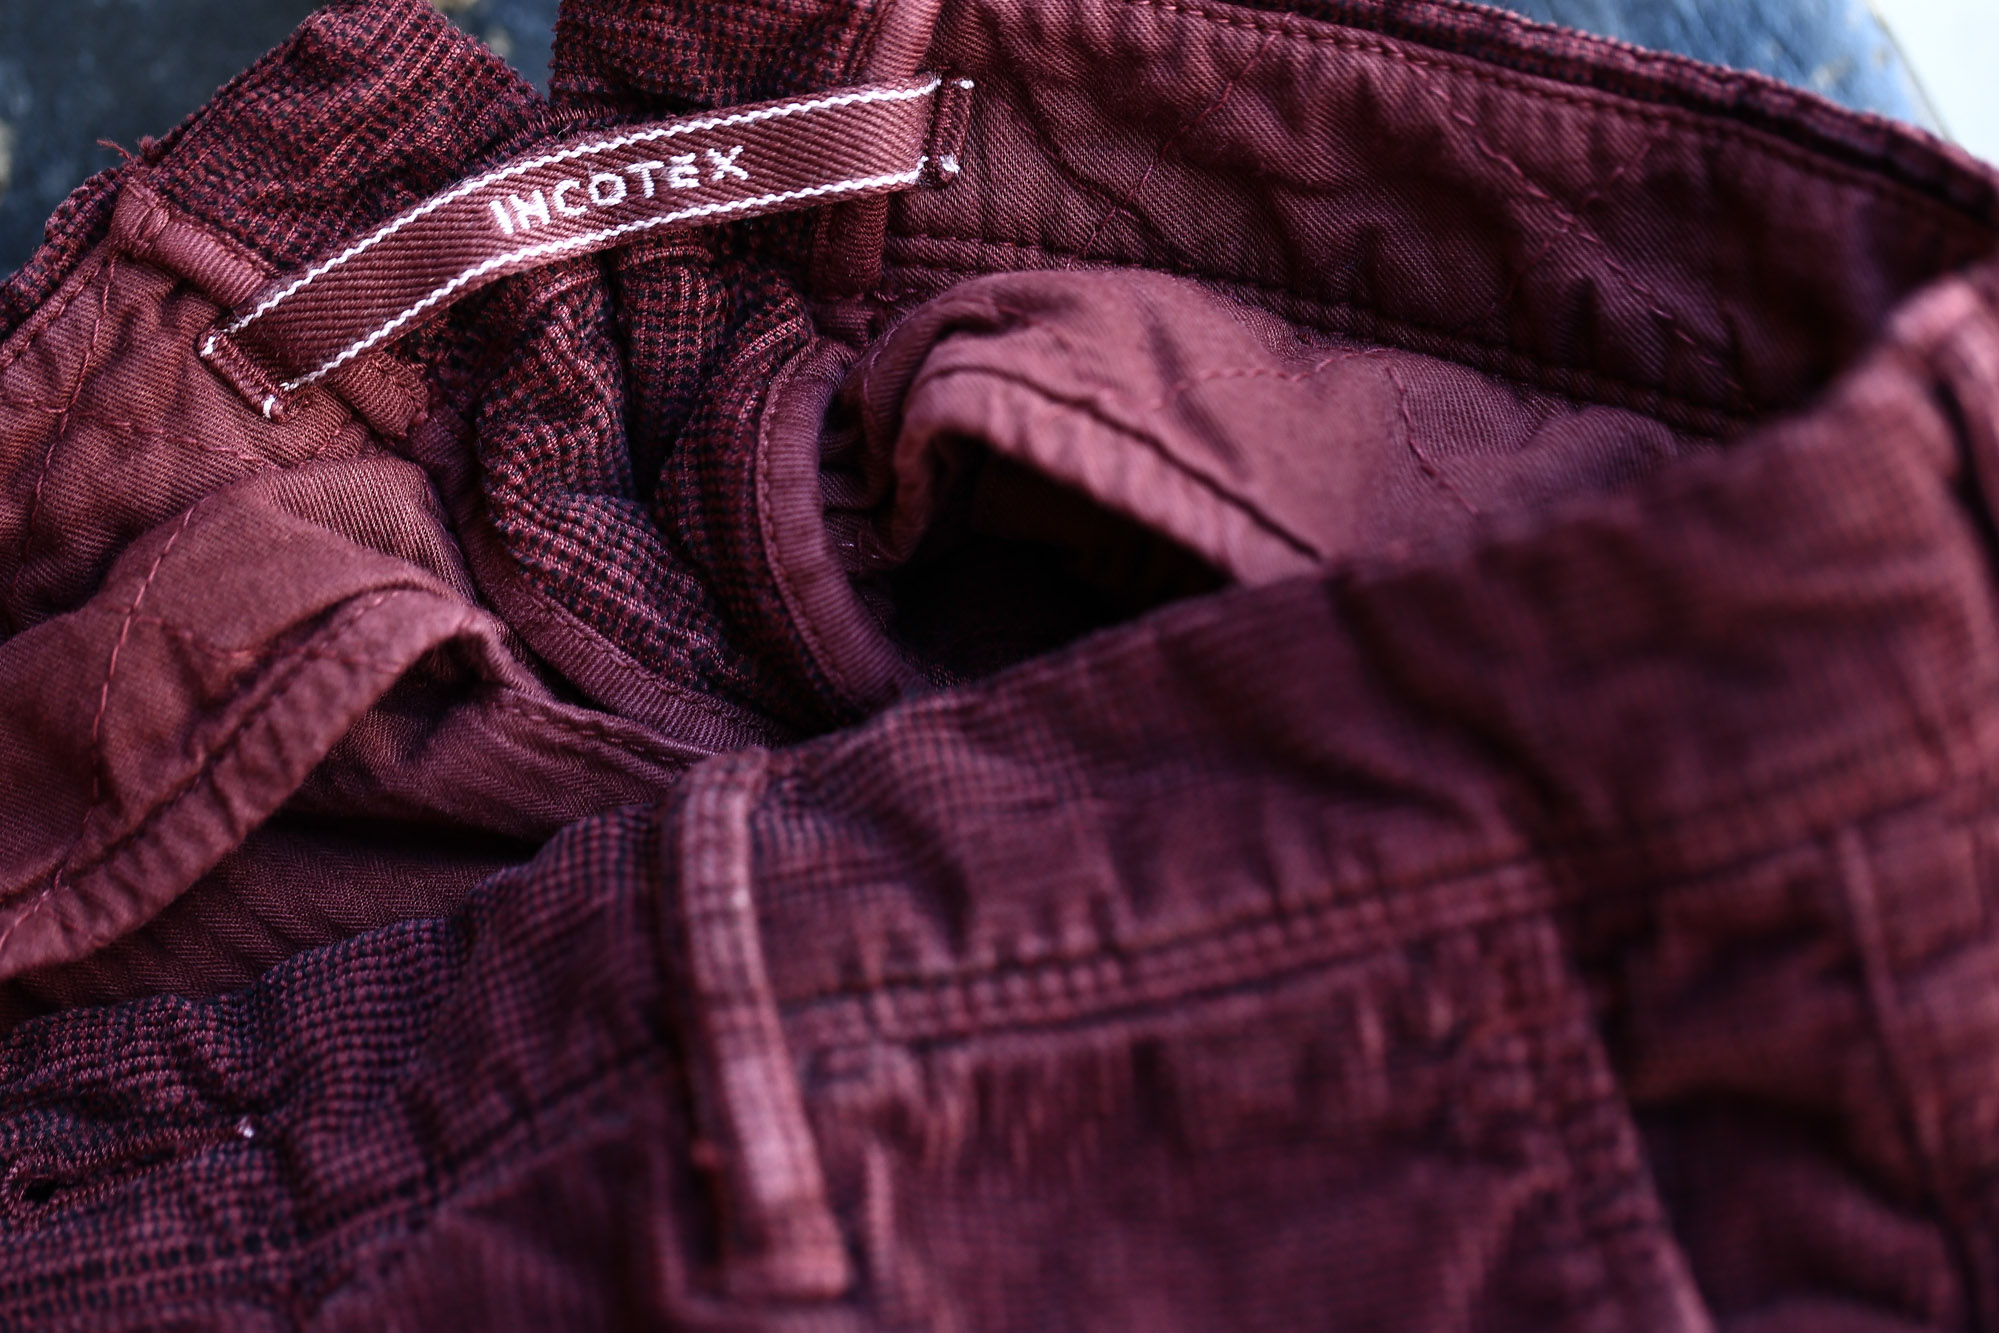 INCOTEX SLACKS(インコテックススラックス) 1ST603 SLIM FIT Garment Dyed Stretch Waffle ストレッチ ワッフルコーデュロイ パンツ BORDEAUX (ボルドー・226) 2016 秋冬新作 の画像。バーガンディー 愛知 名古屋 ZODIAC ゾディアック 入荷。